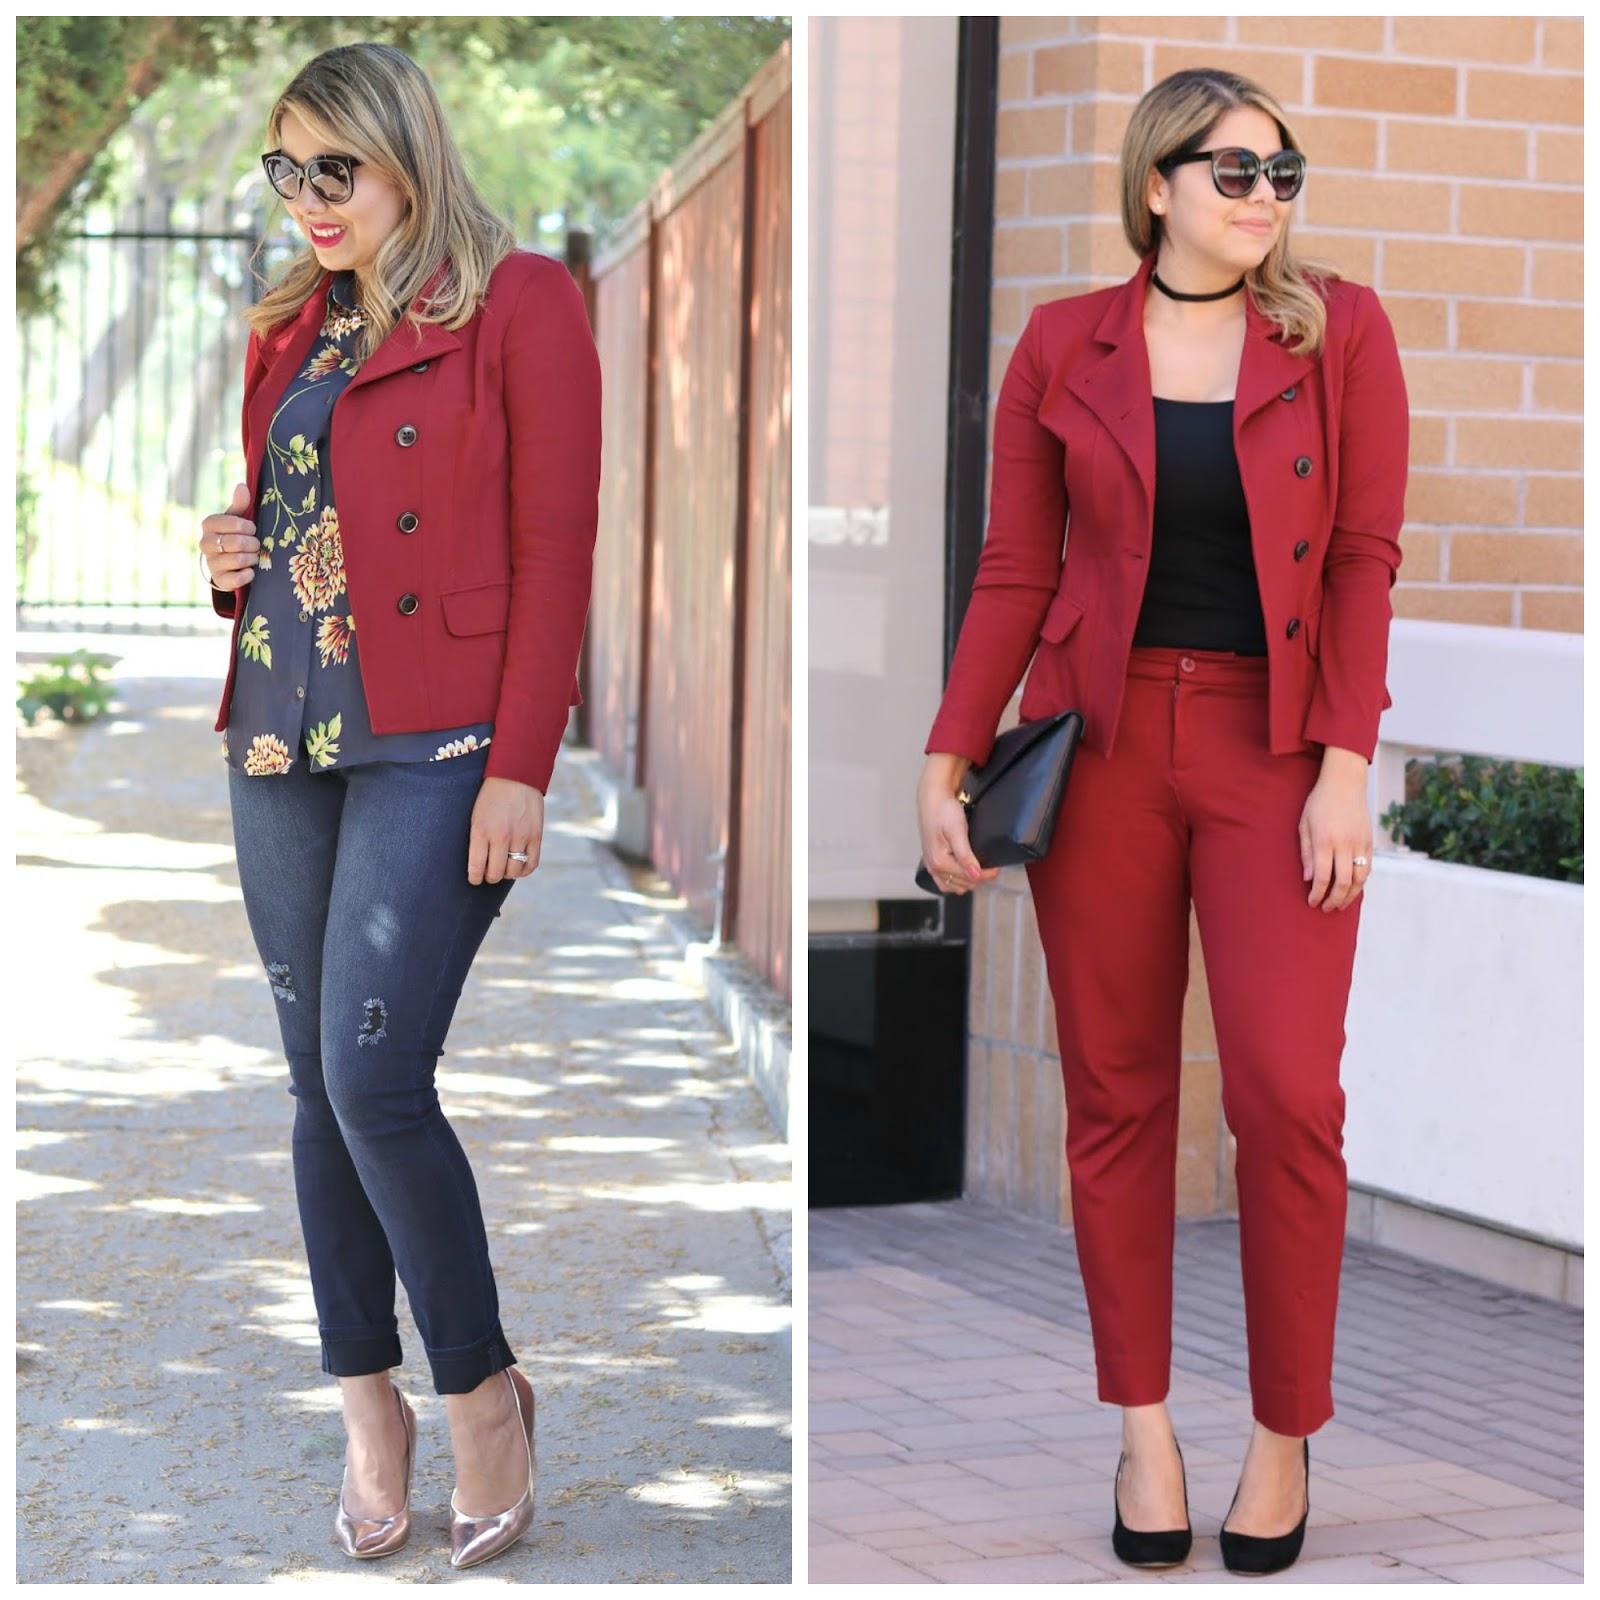 cabi fall 2016, cabi red outing blazer, cabi ava trousers, cabi daisy top, cabi blogger, fall 2016 fashion